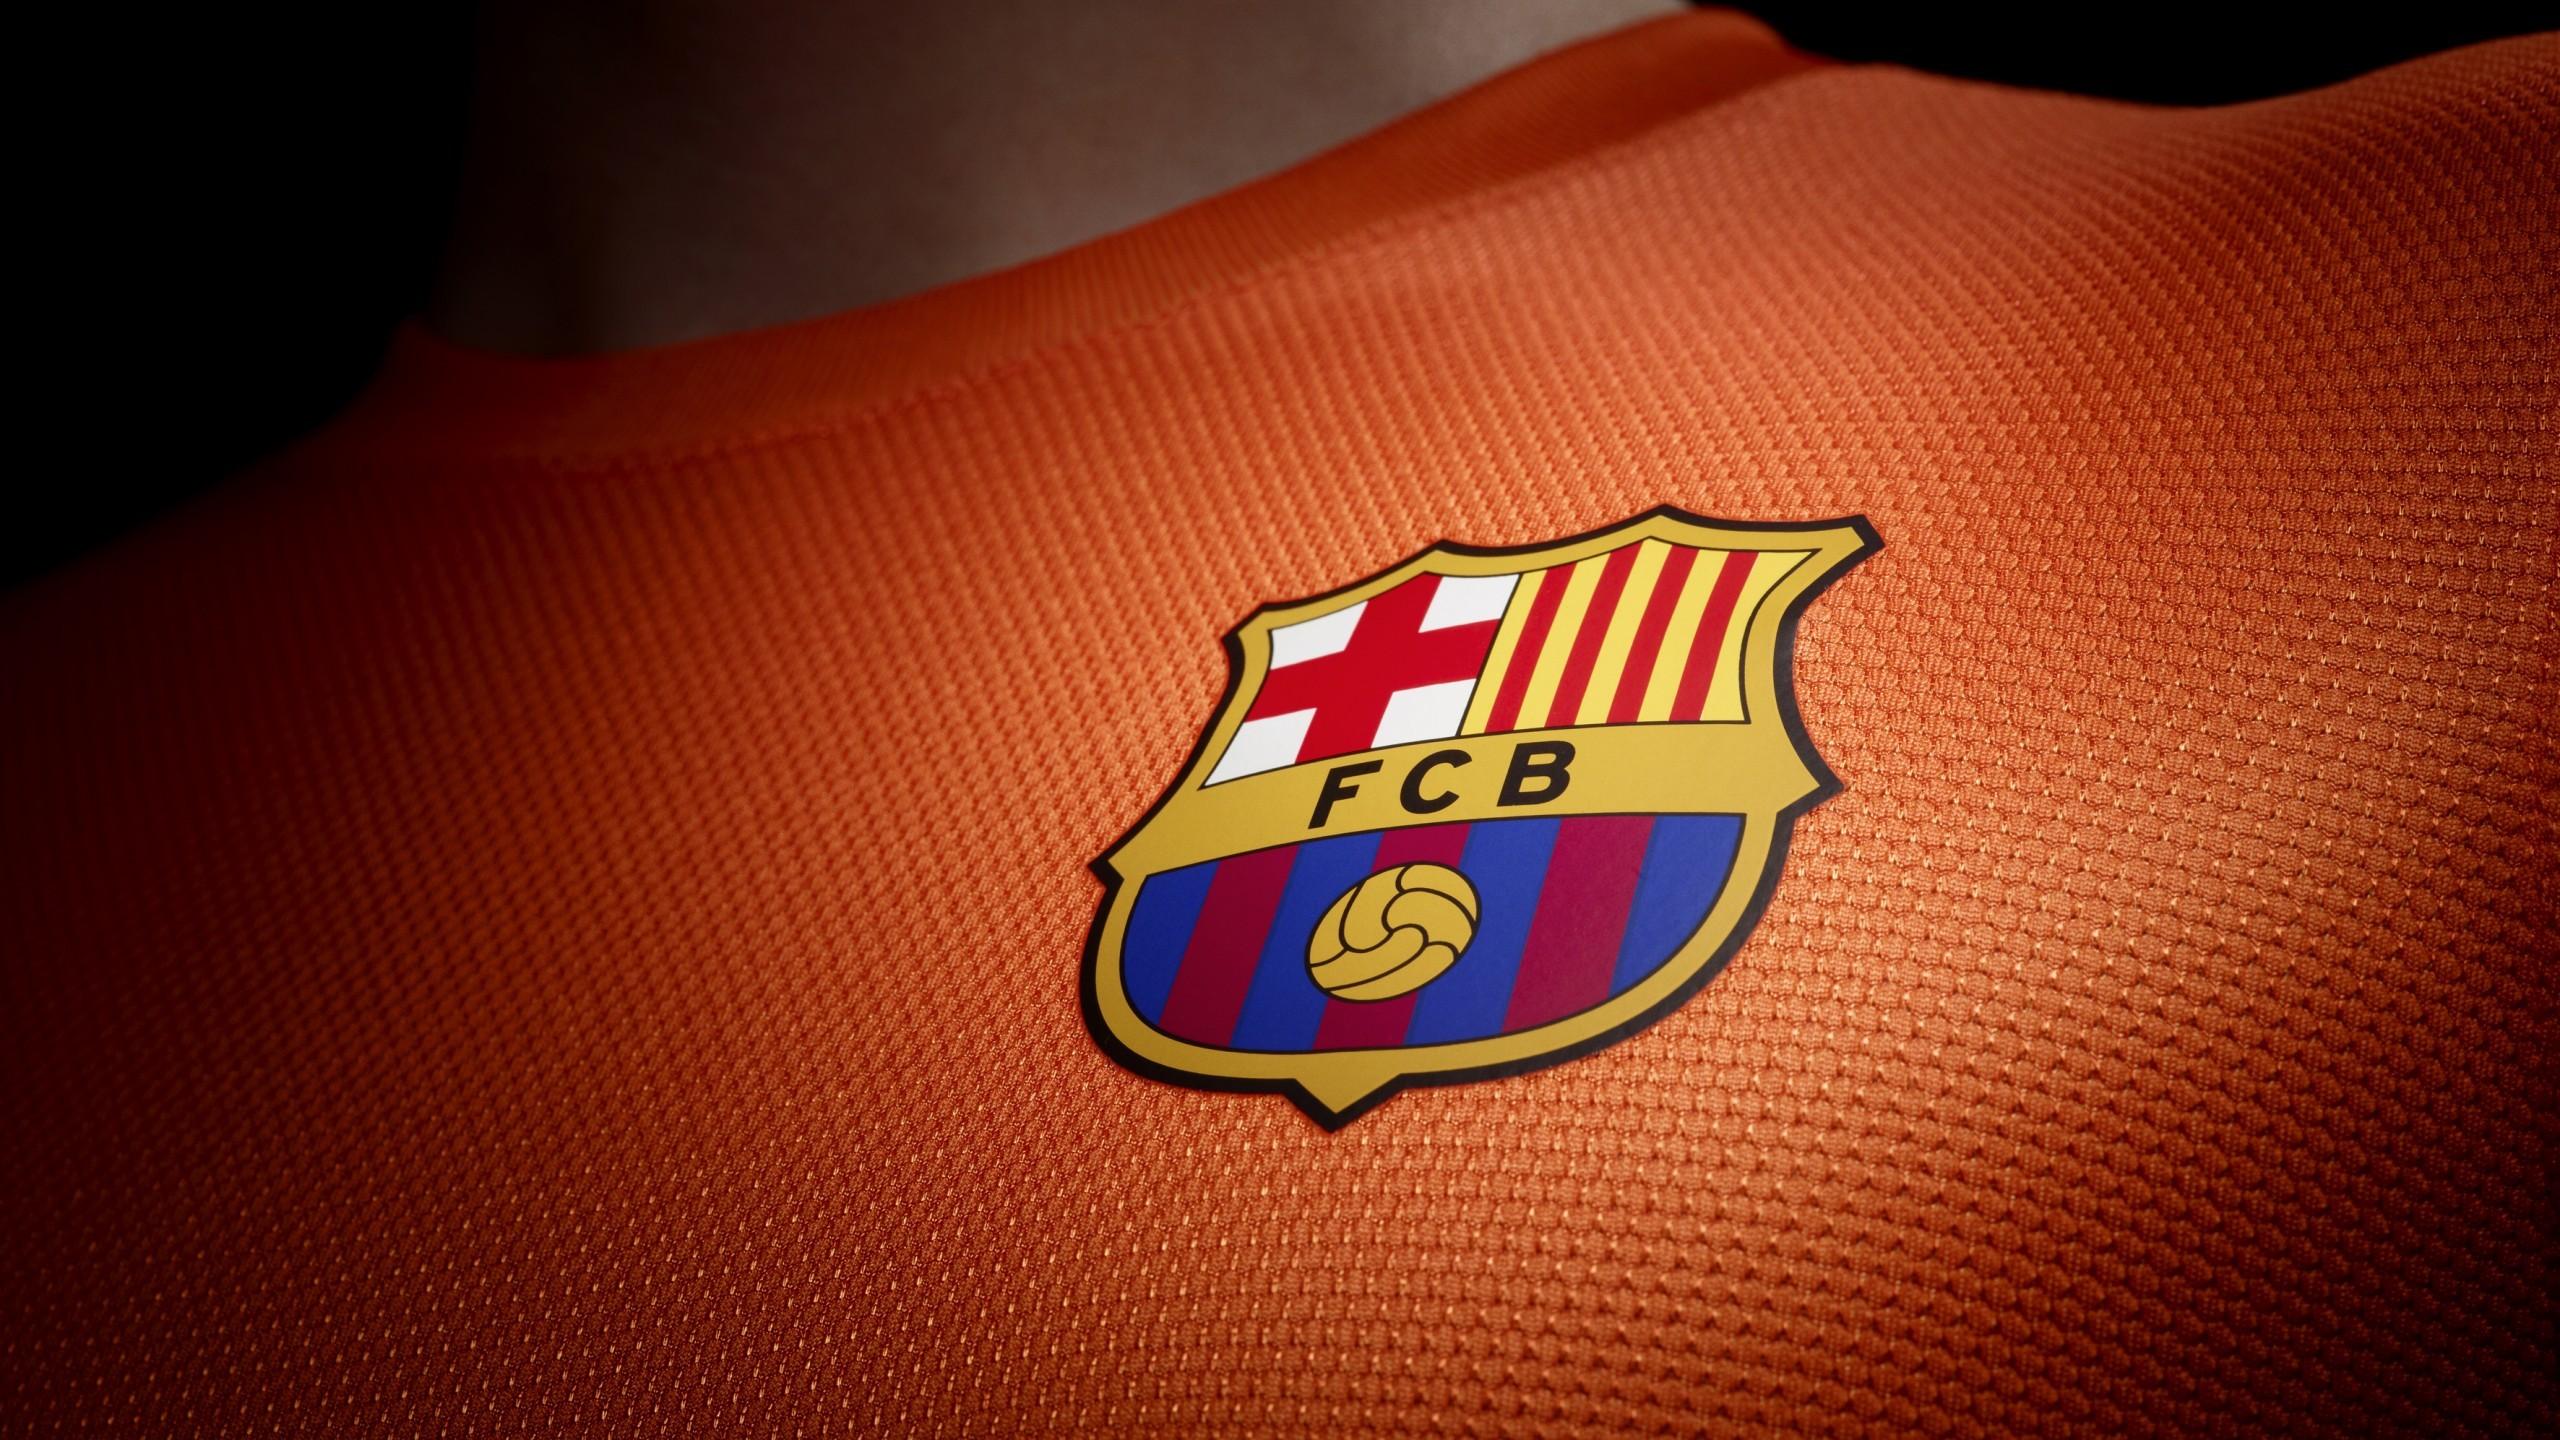 Sports / FC Barcelona Wallpaper